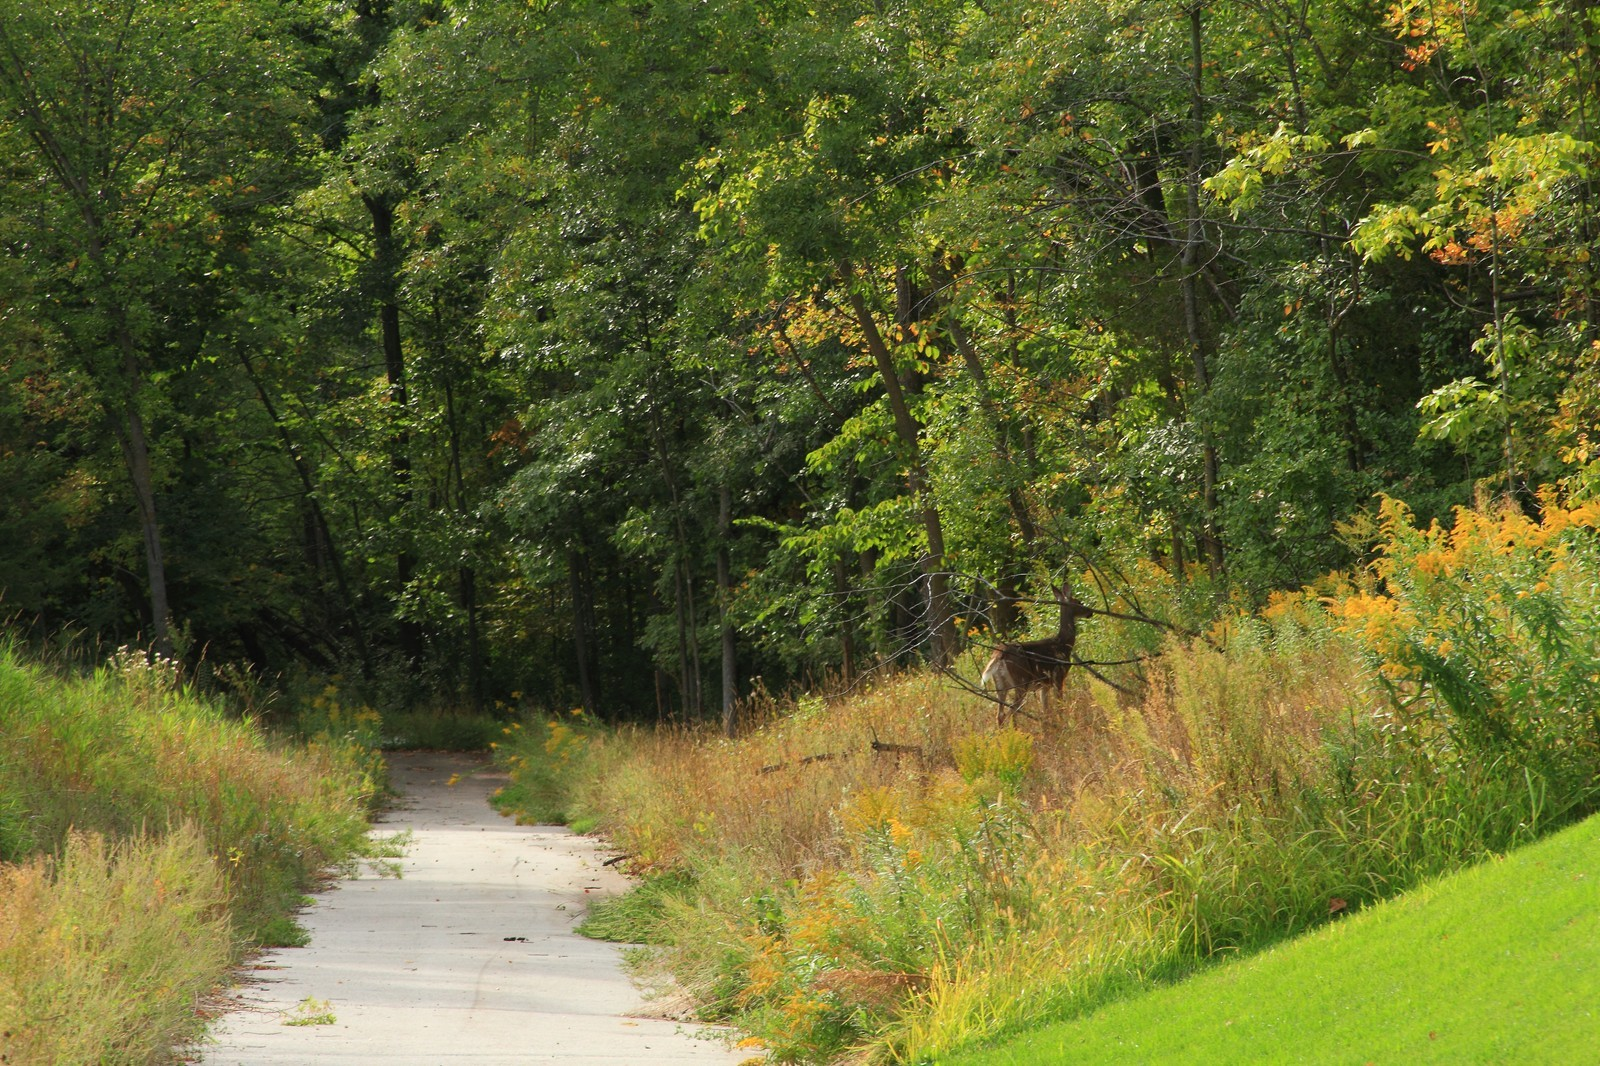 Real Estate Photography - 9627 Sky Lane, Eden Prairie, MN, 55347 - Location 1